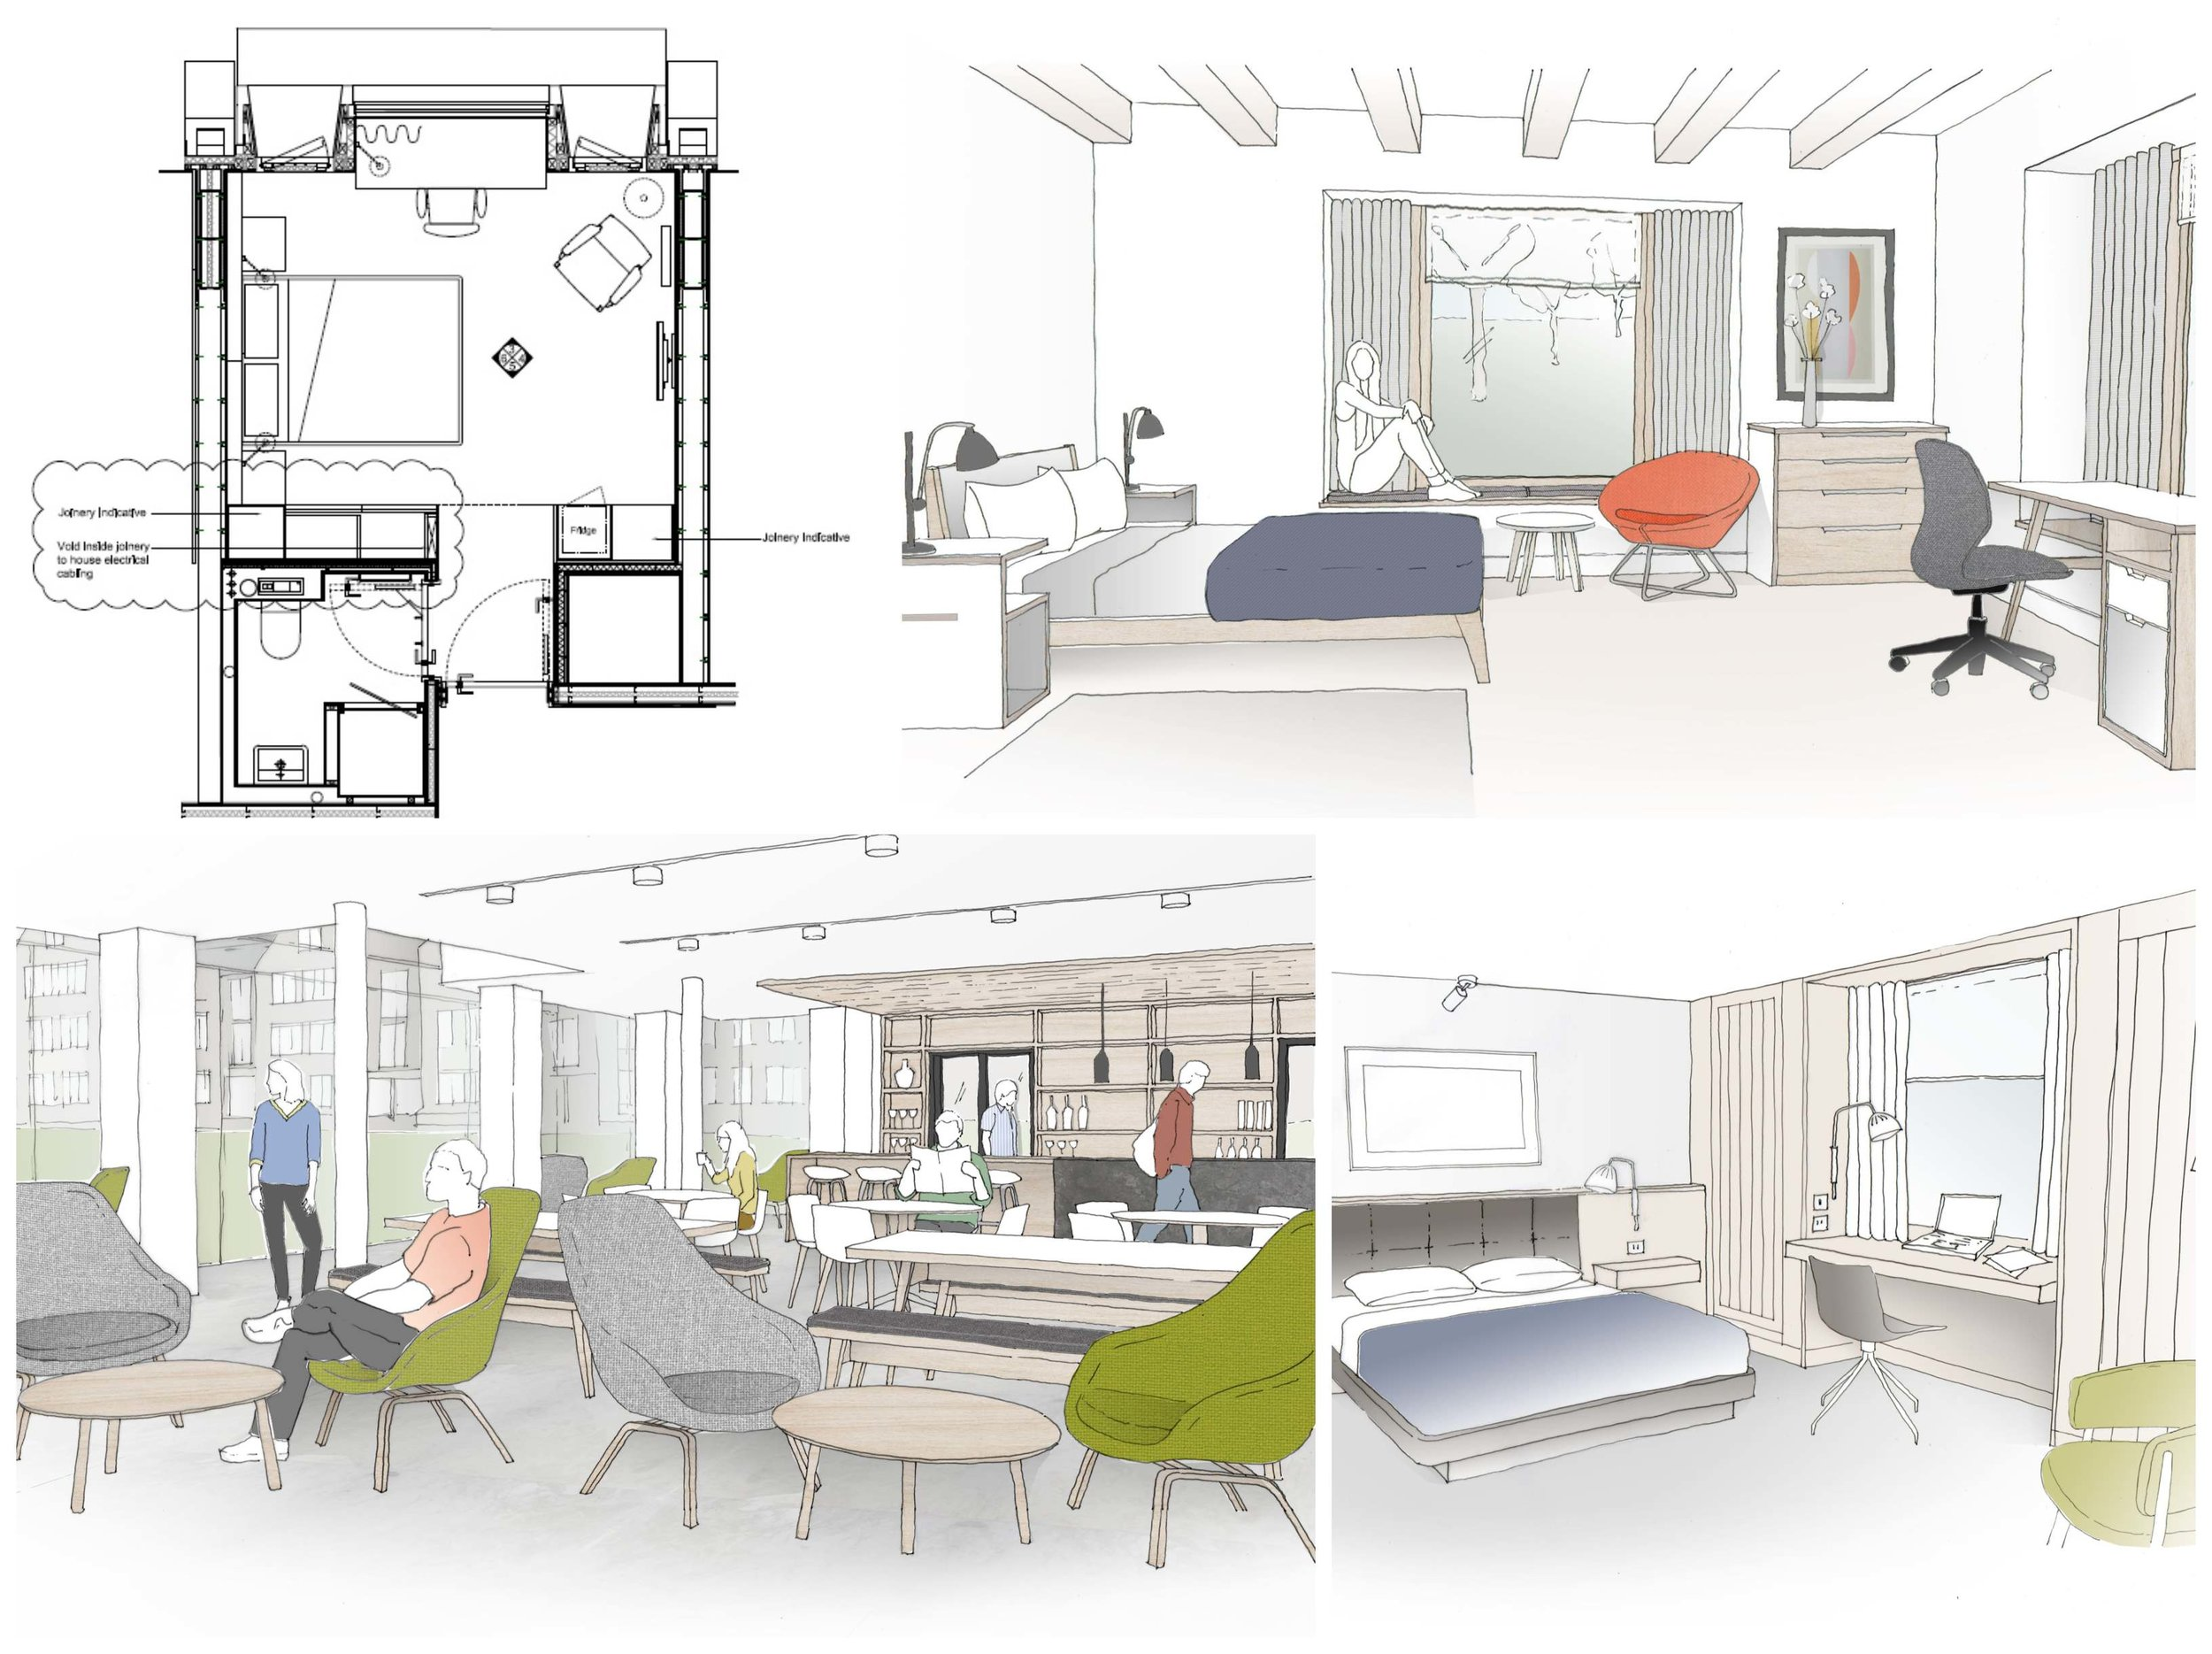 Concept & Design Development